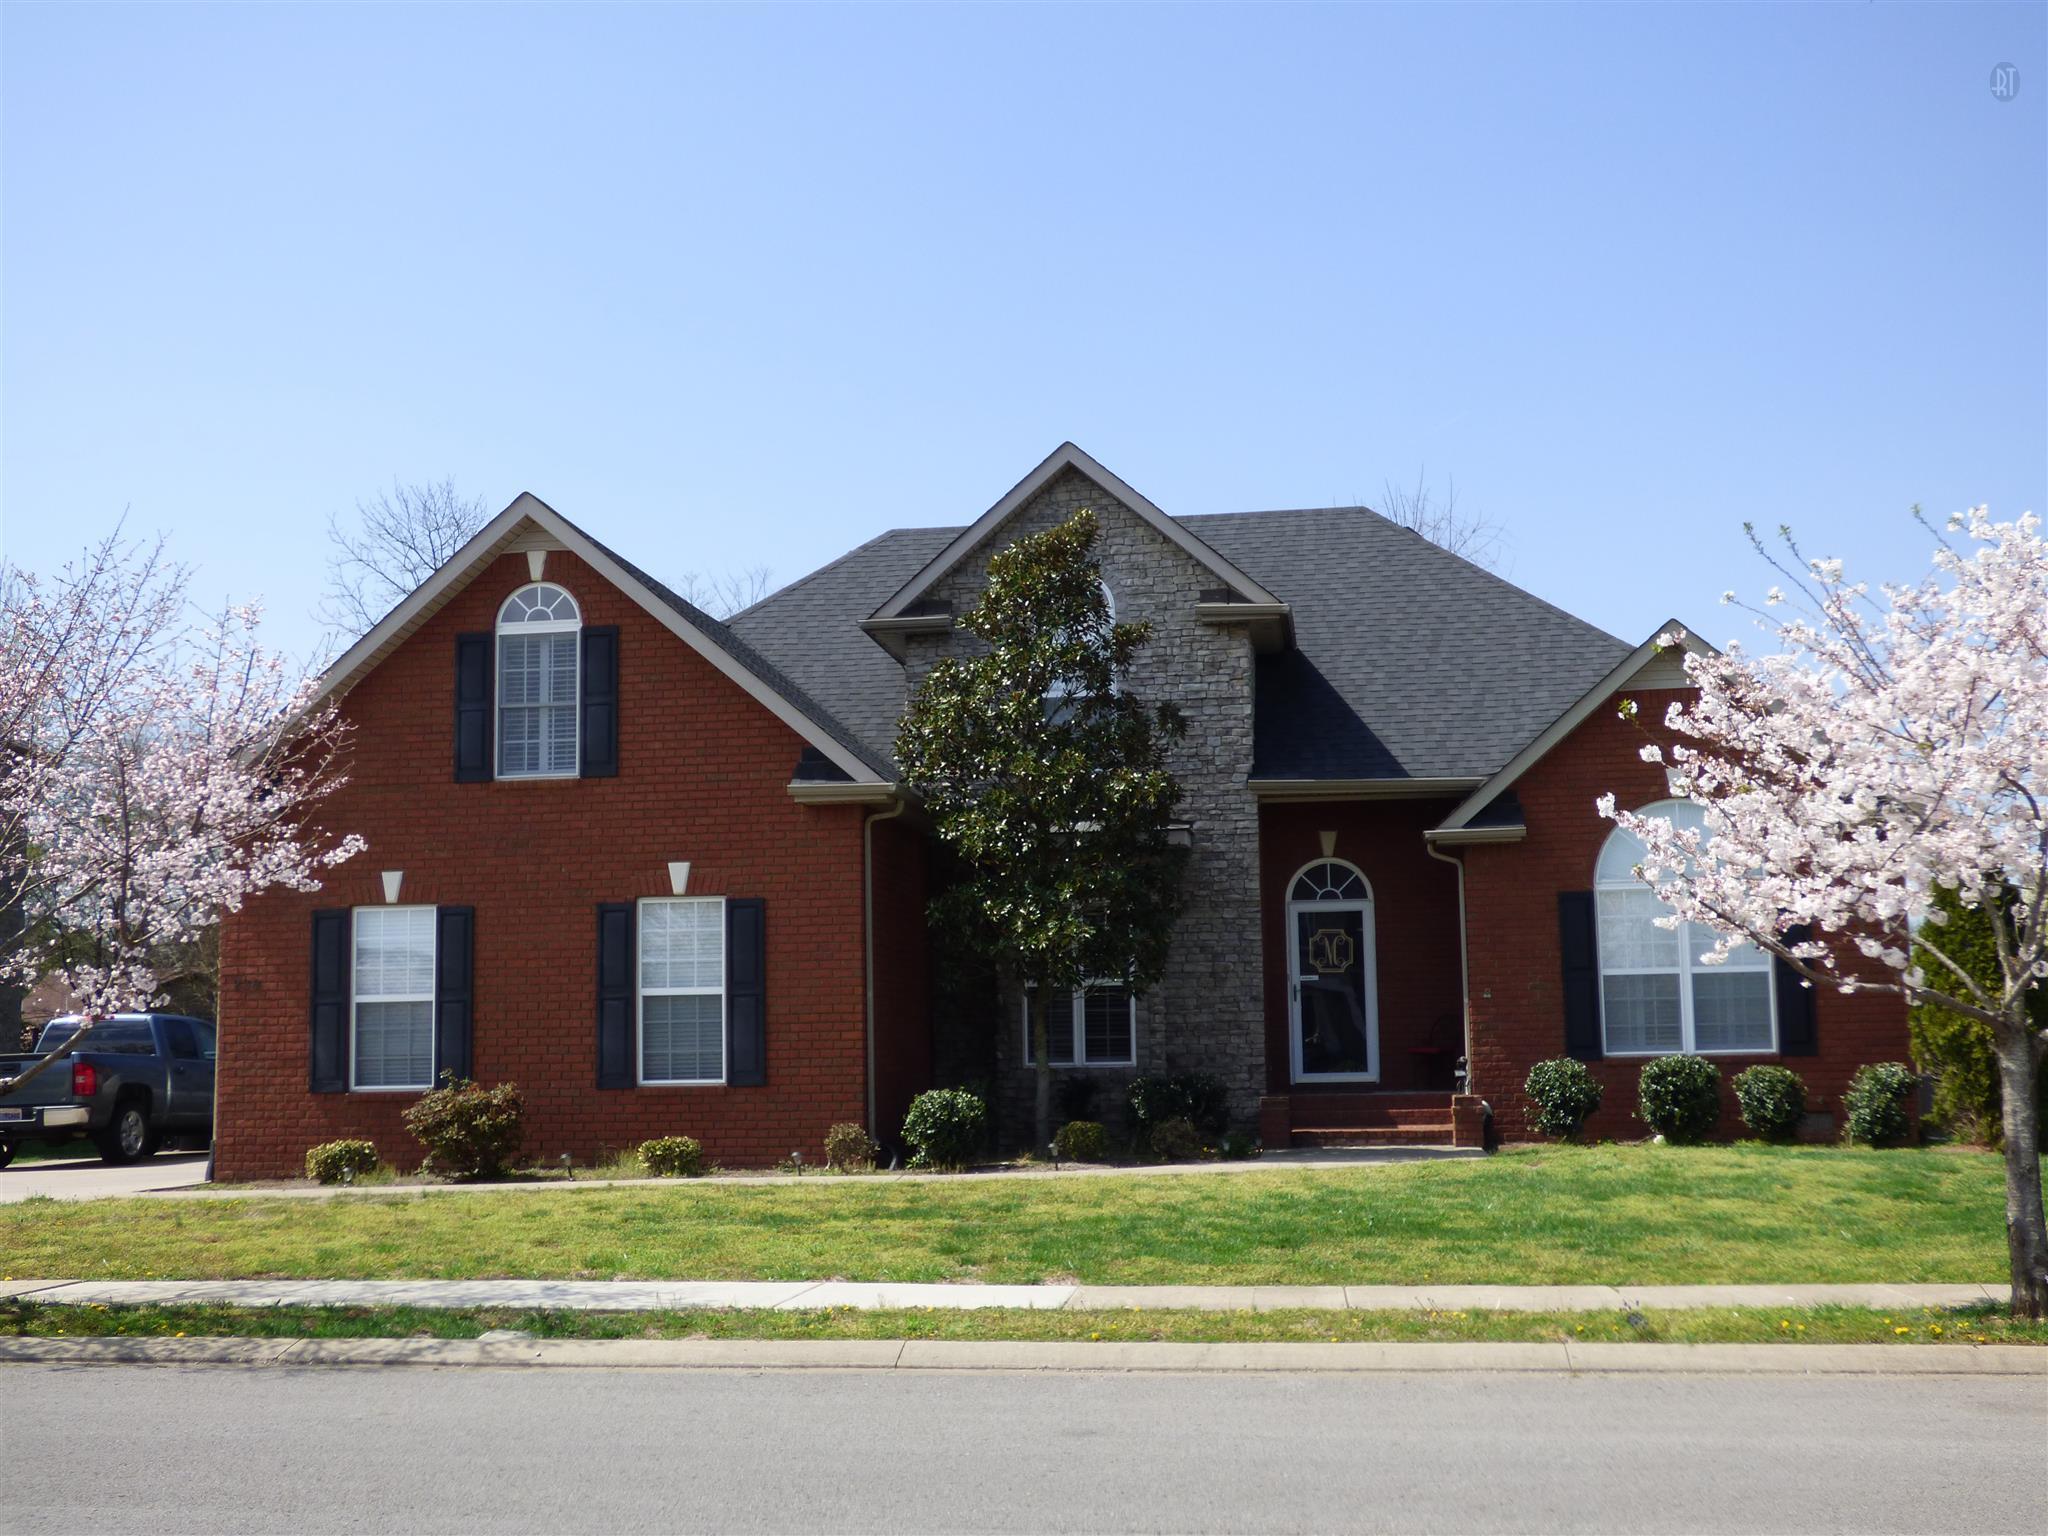 238 Foundry Cir, Murfreesboro, TN